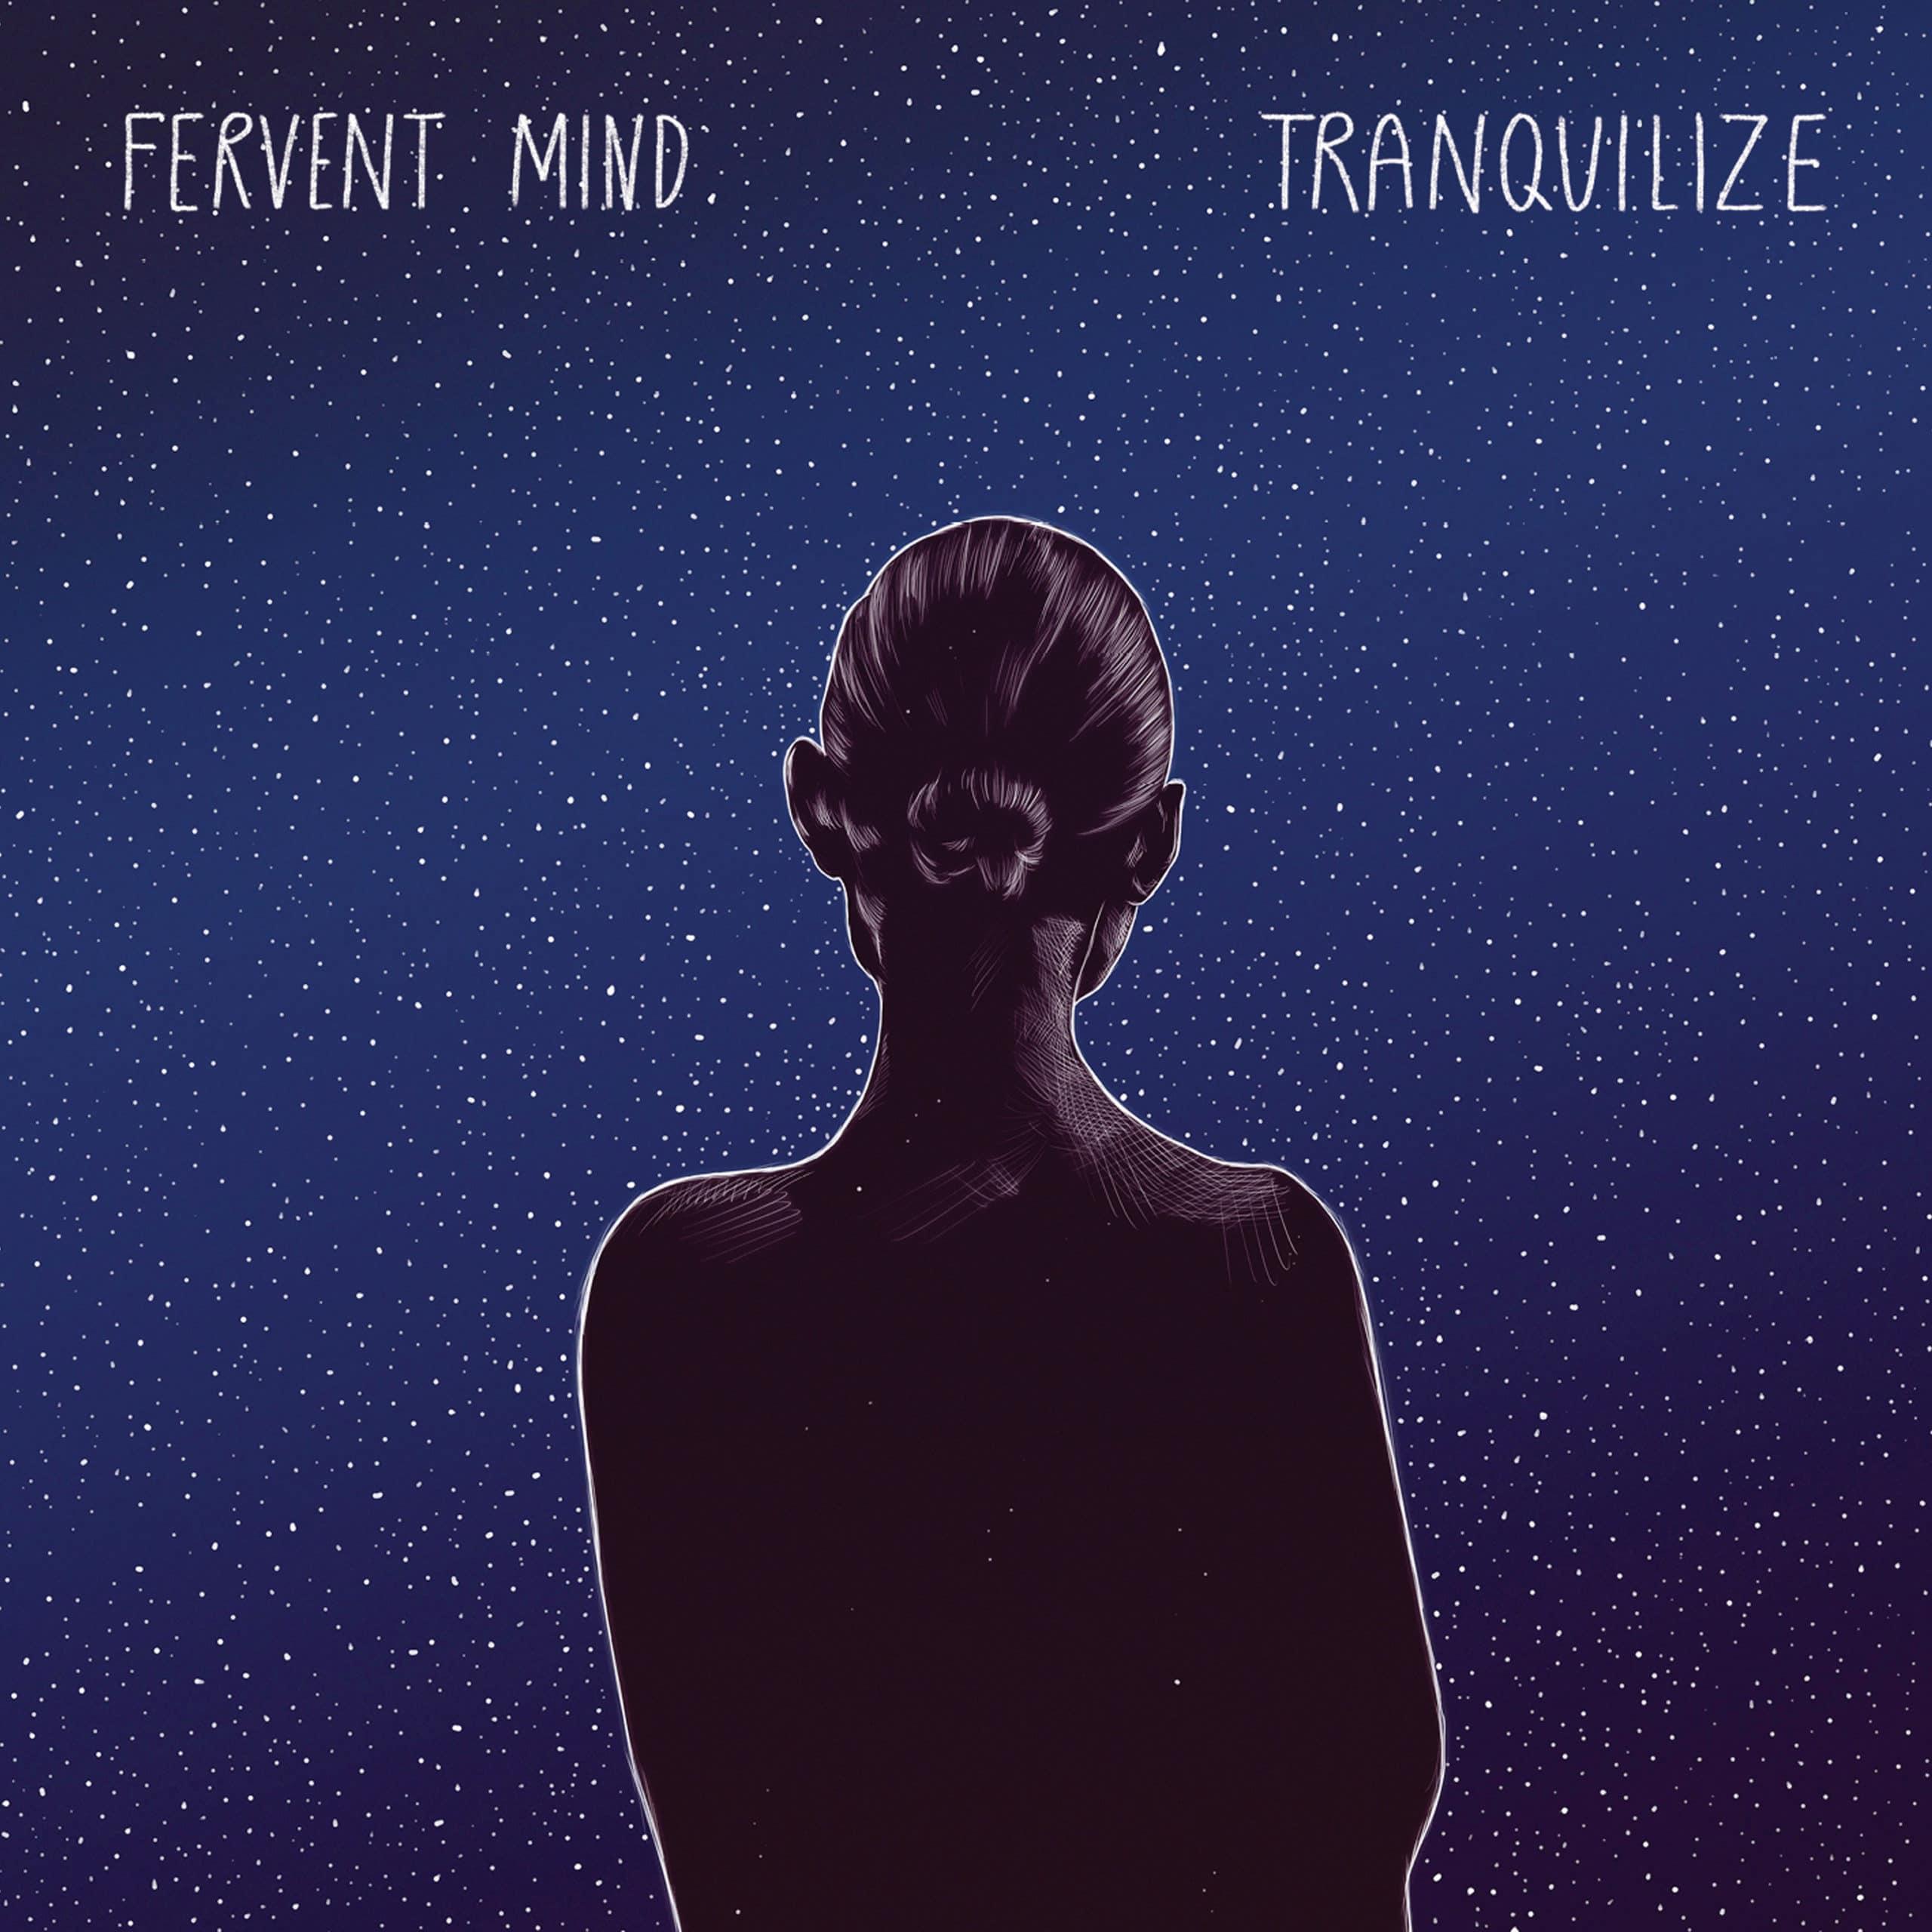 Fervent Mind - Tranquilize